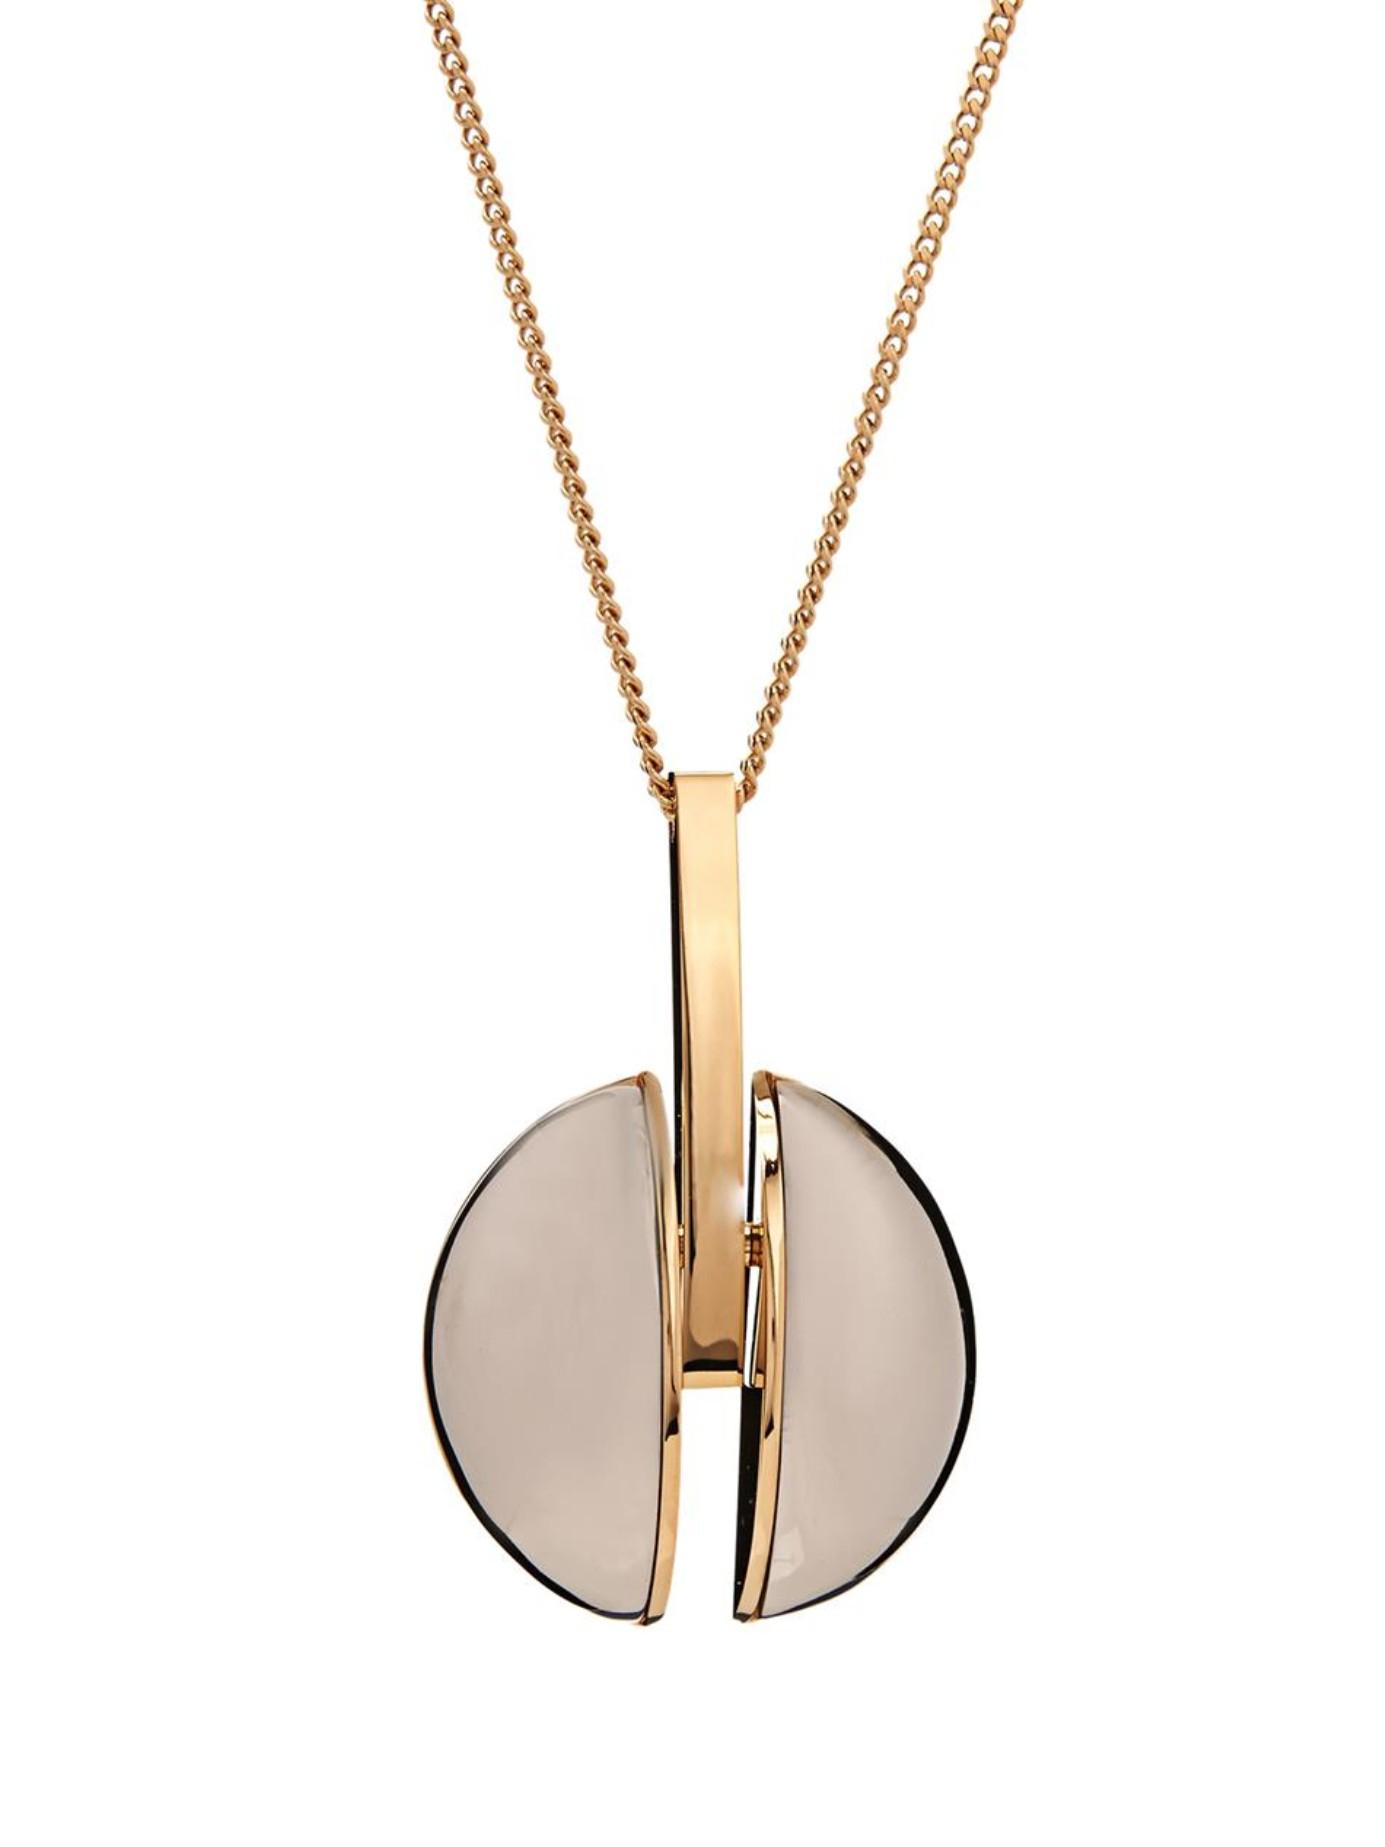 Lyst - Chloé Ellie Necklace in Metallic 892157a12